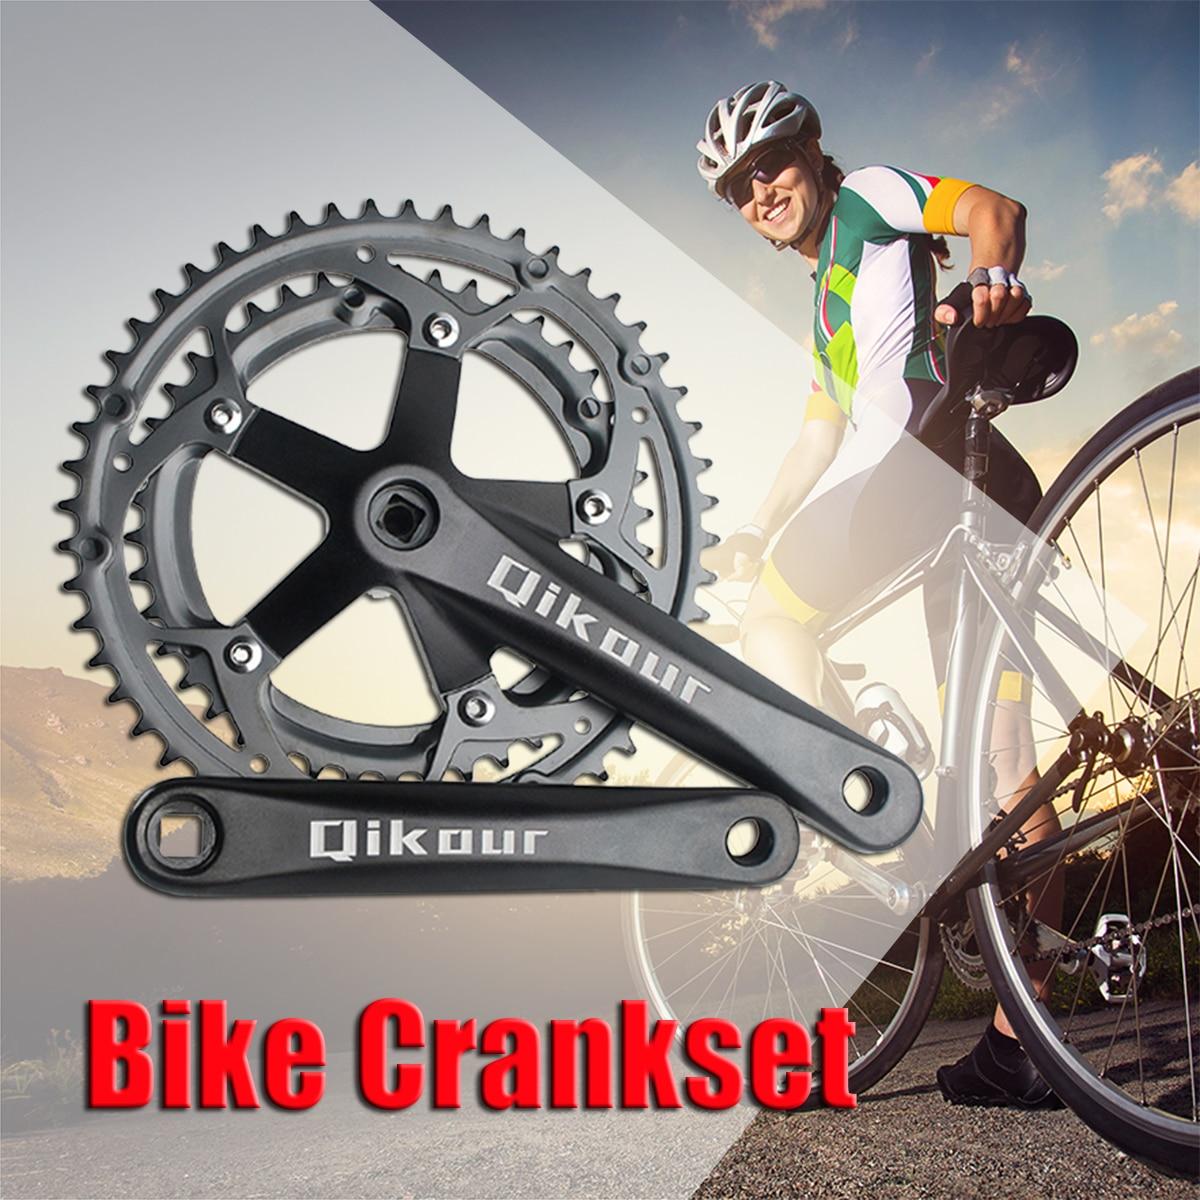 Aluminum Alloy Bicycle Chainwheel Bike Circle Crankset Single Plate Mountain Bicycle Chainring Crankset For Folding Bike mtb road mountain cycling bike bicycle chainwheel cranksets crankset cranks 42t aluminum alloy